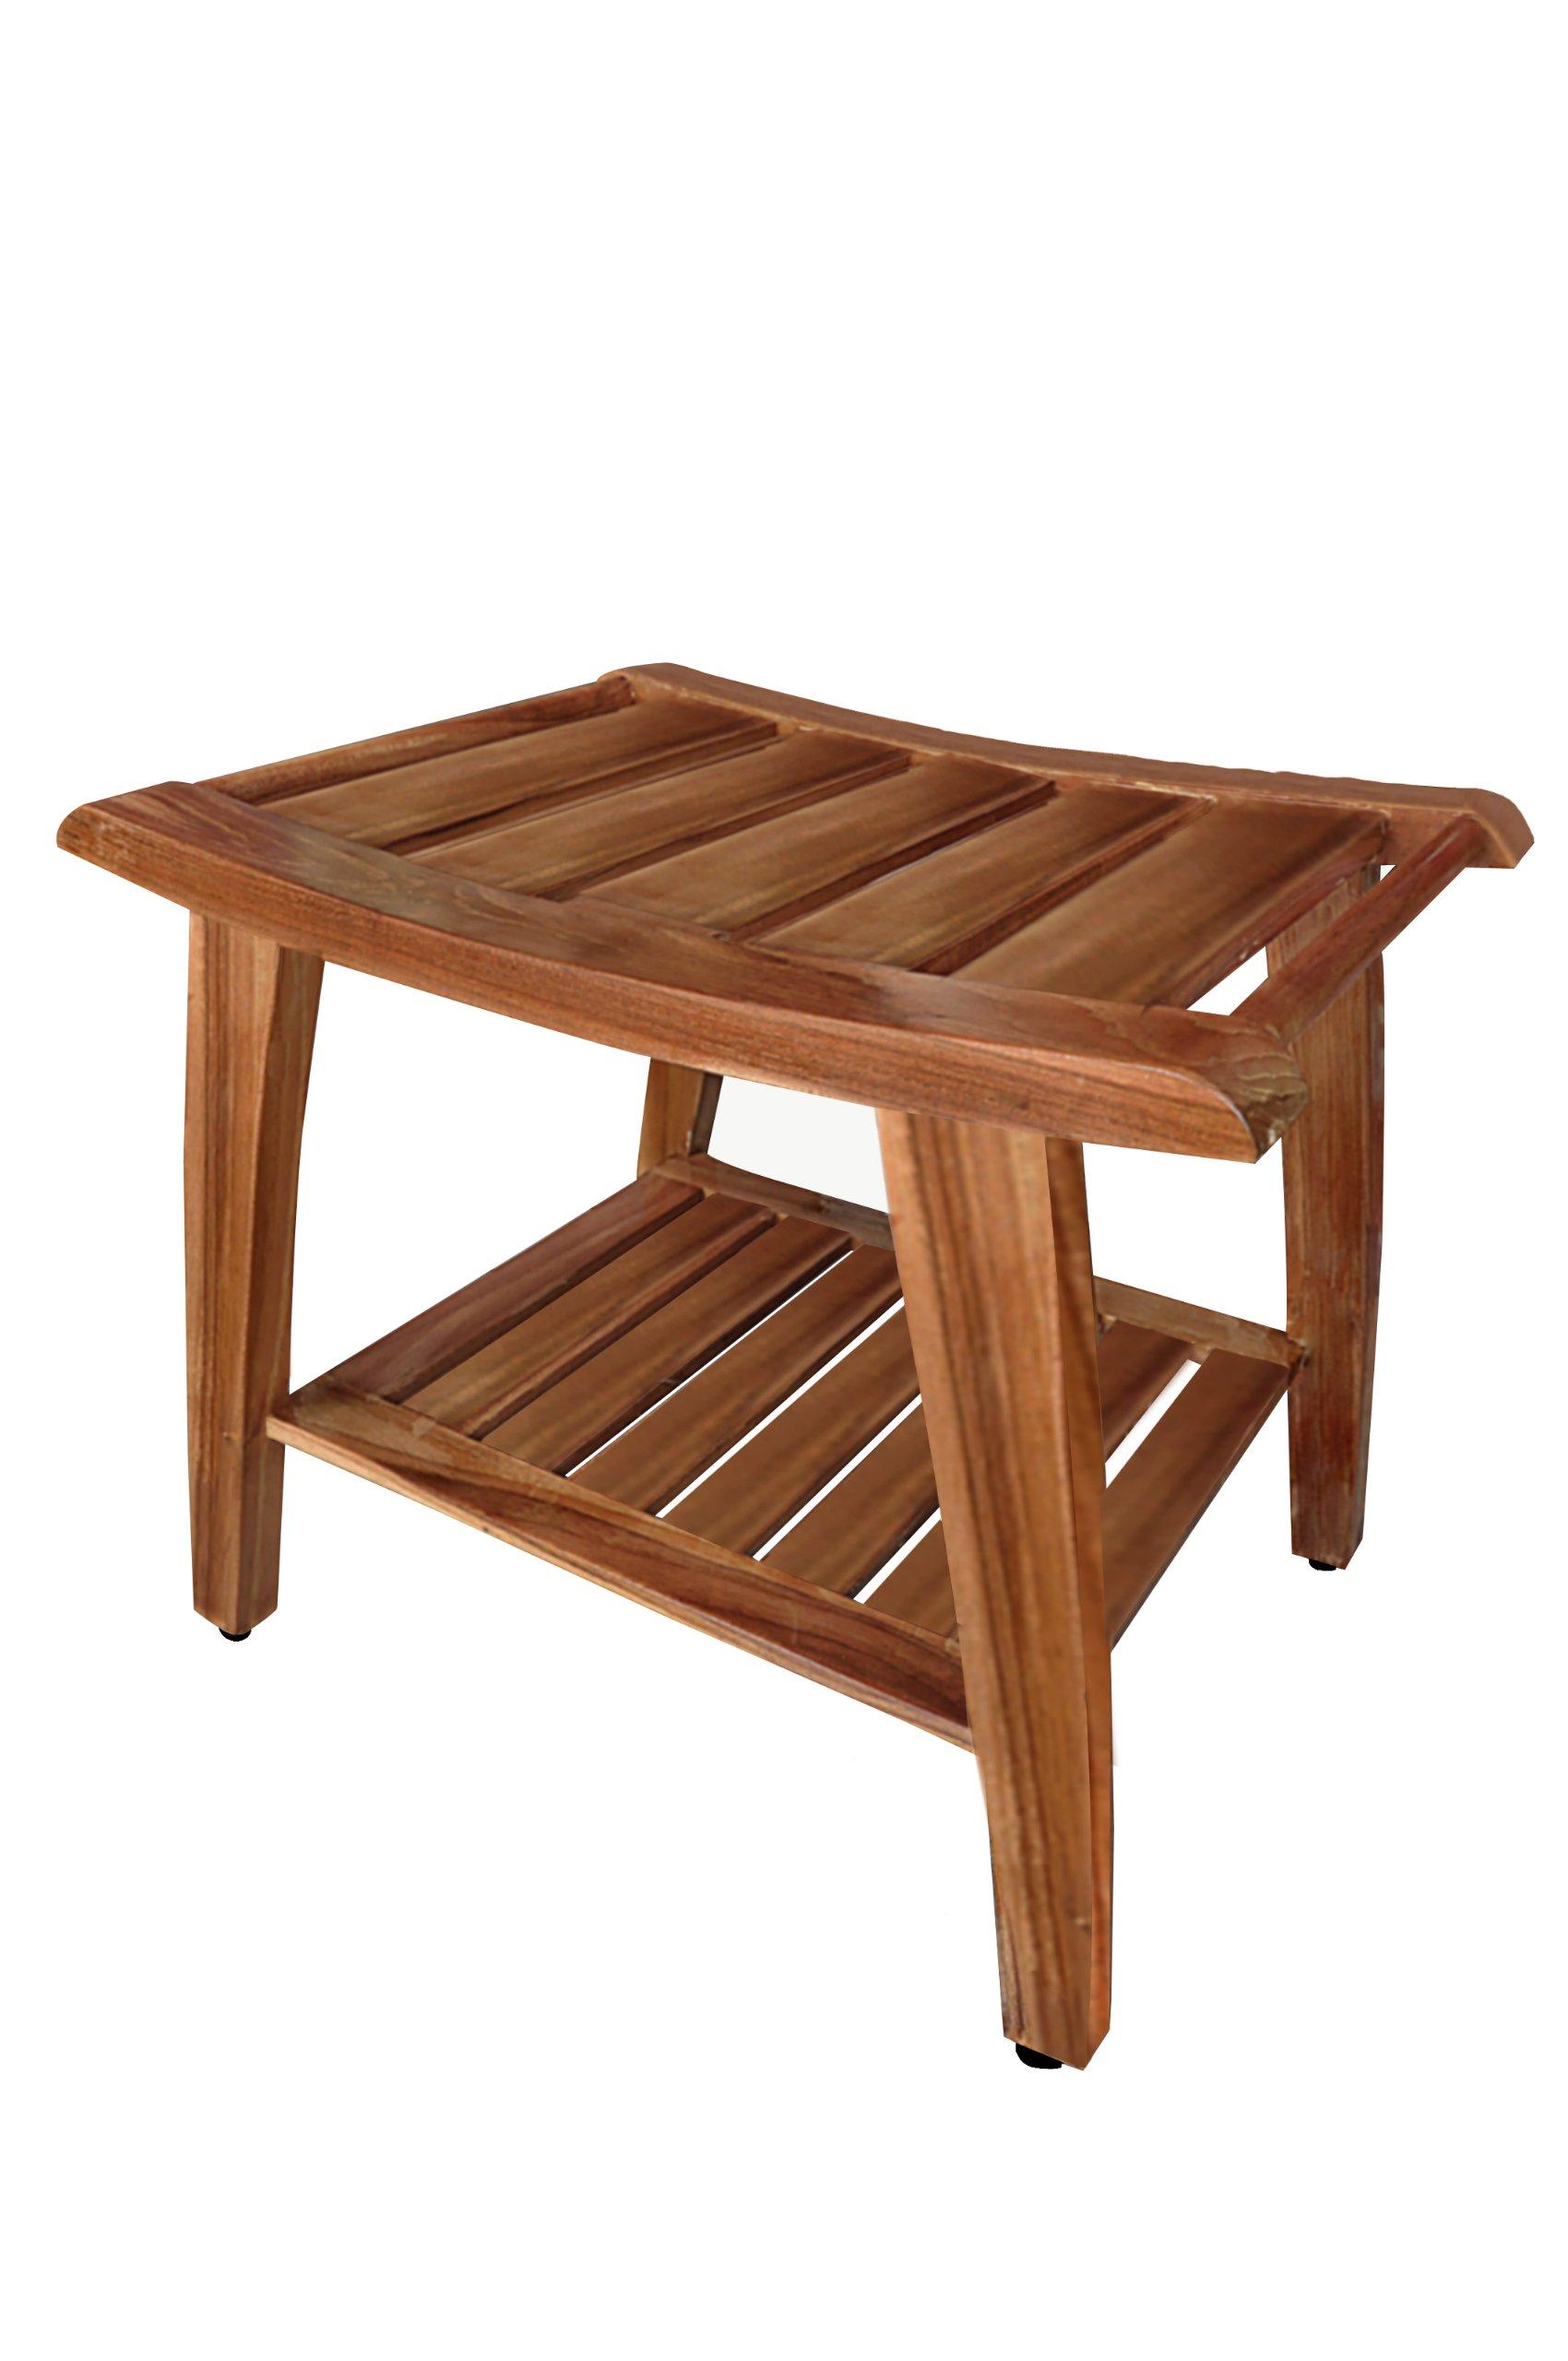 Grade-A All Teak Wood Shower / Bath Room / Pool Bench Stool with Shelf